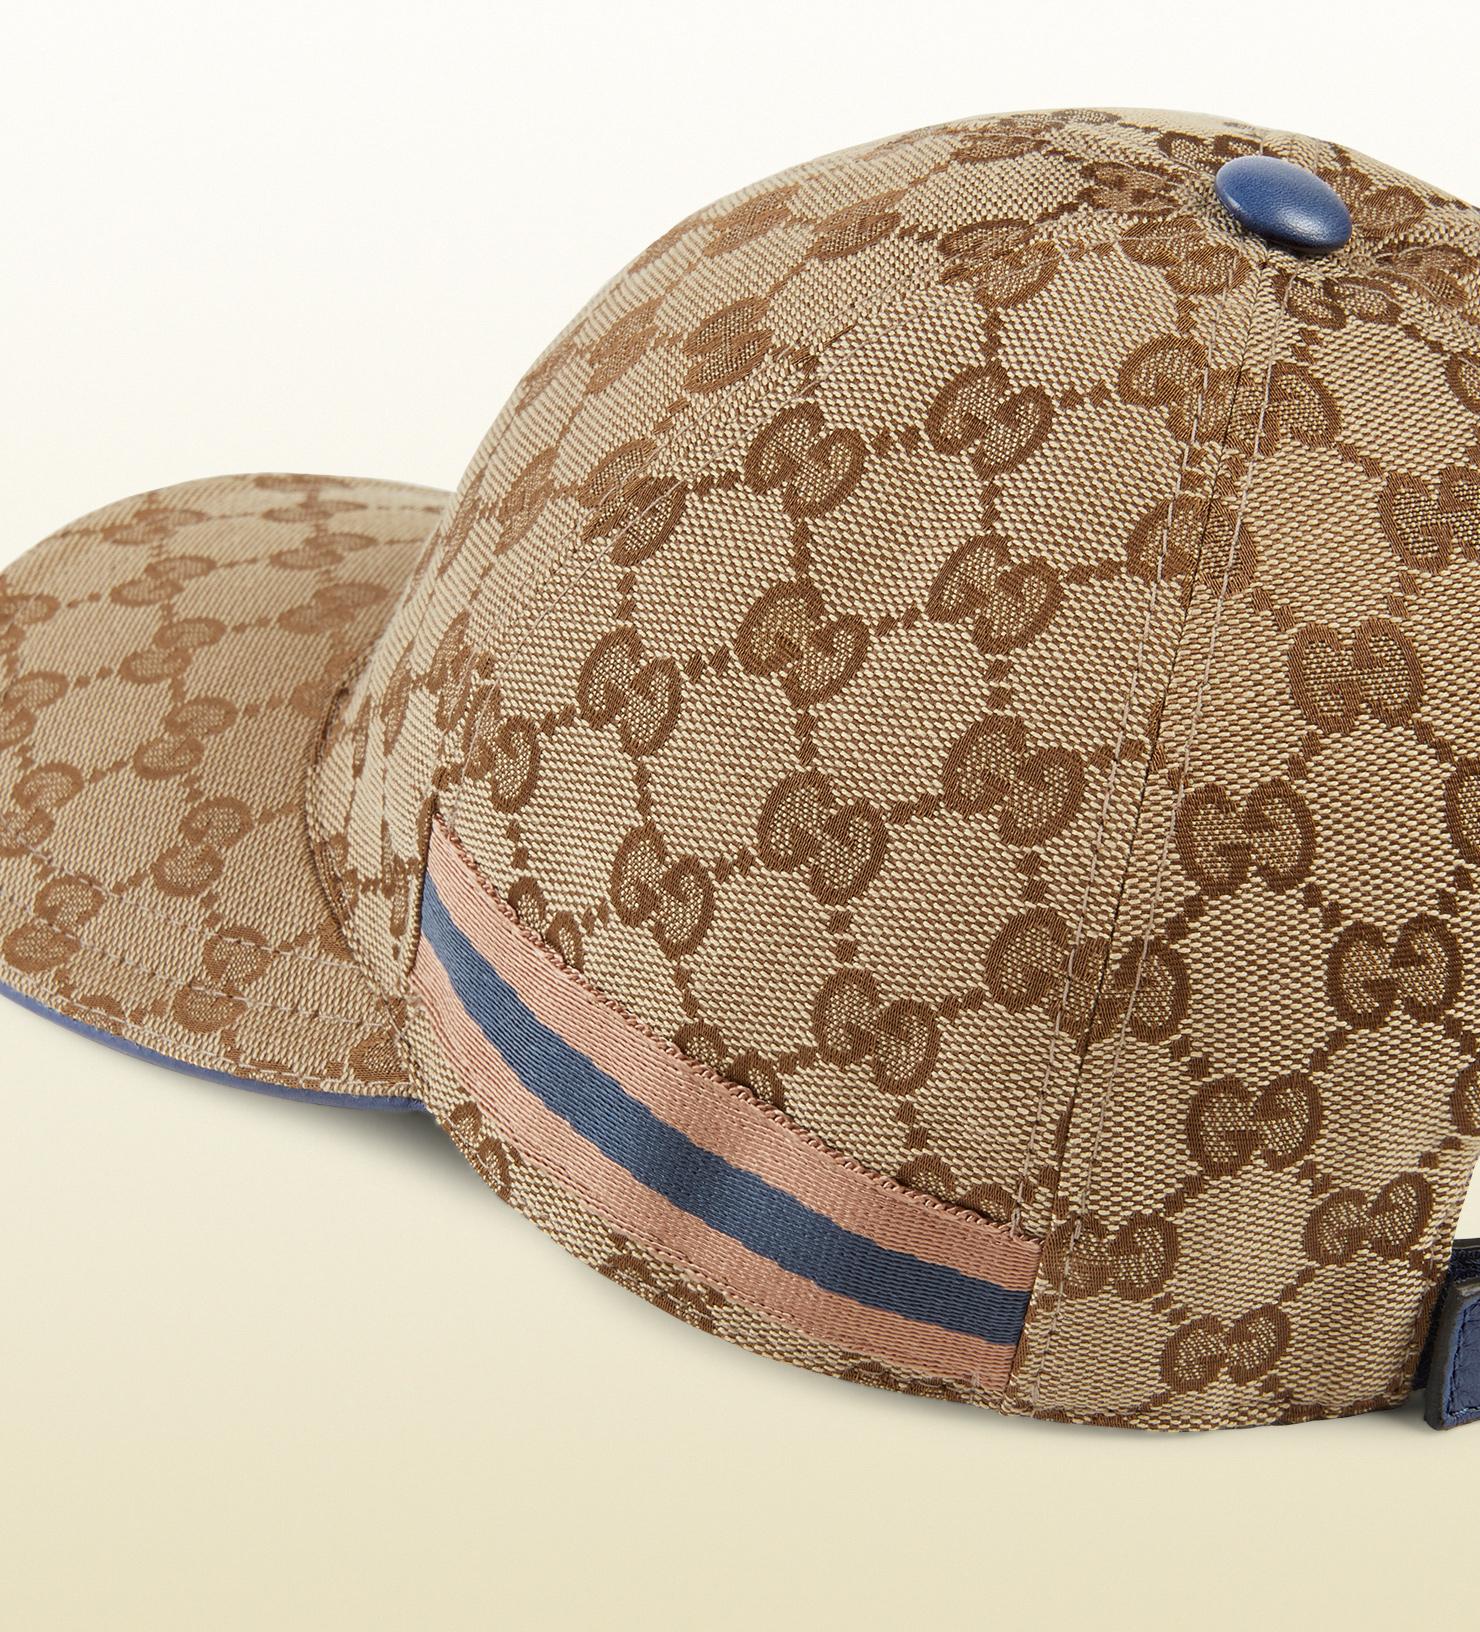 a04dbca89e4b1 Gucci Original Gg Canvas Baseball Hat in Natural for Men - Lyst